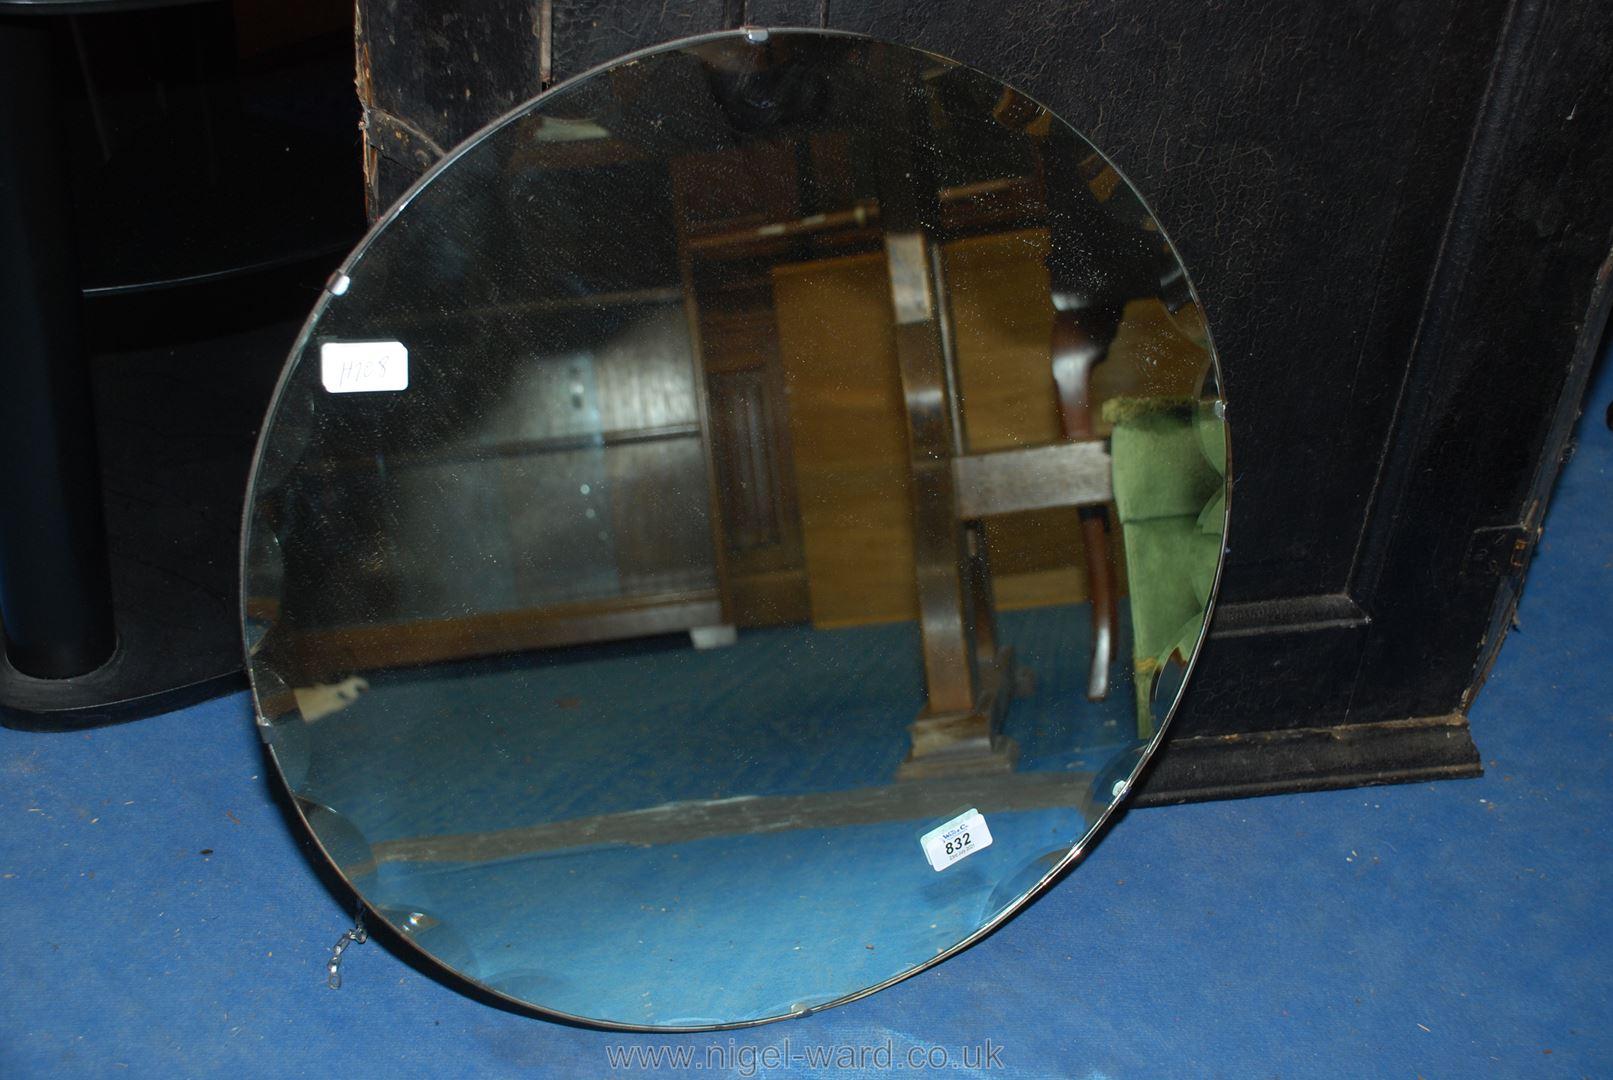 Circular wall pie crust edged mirror, 22'' diameter.